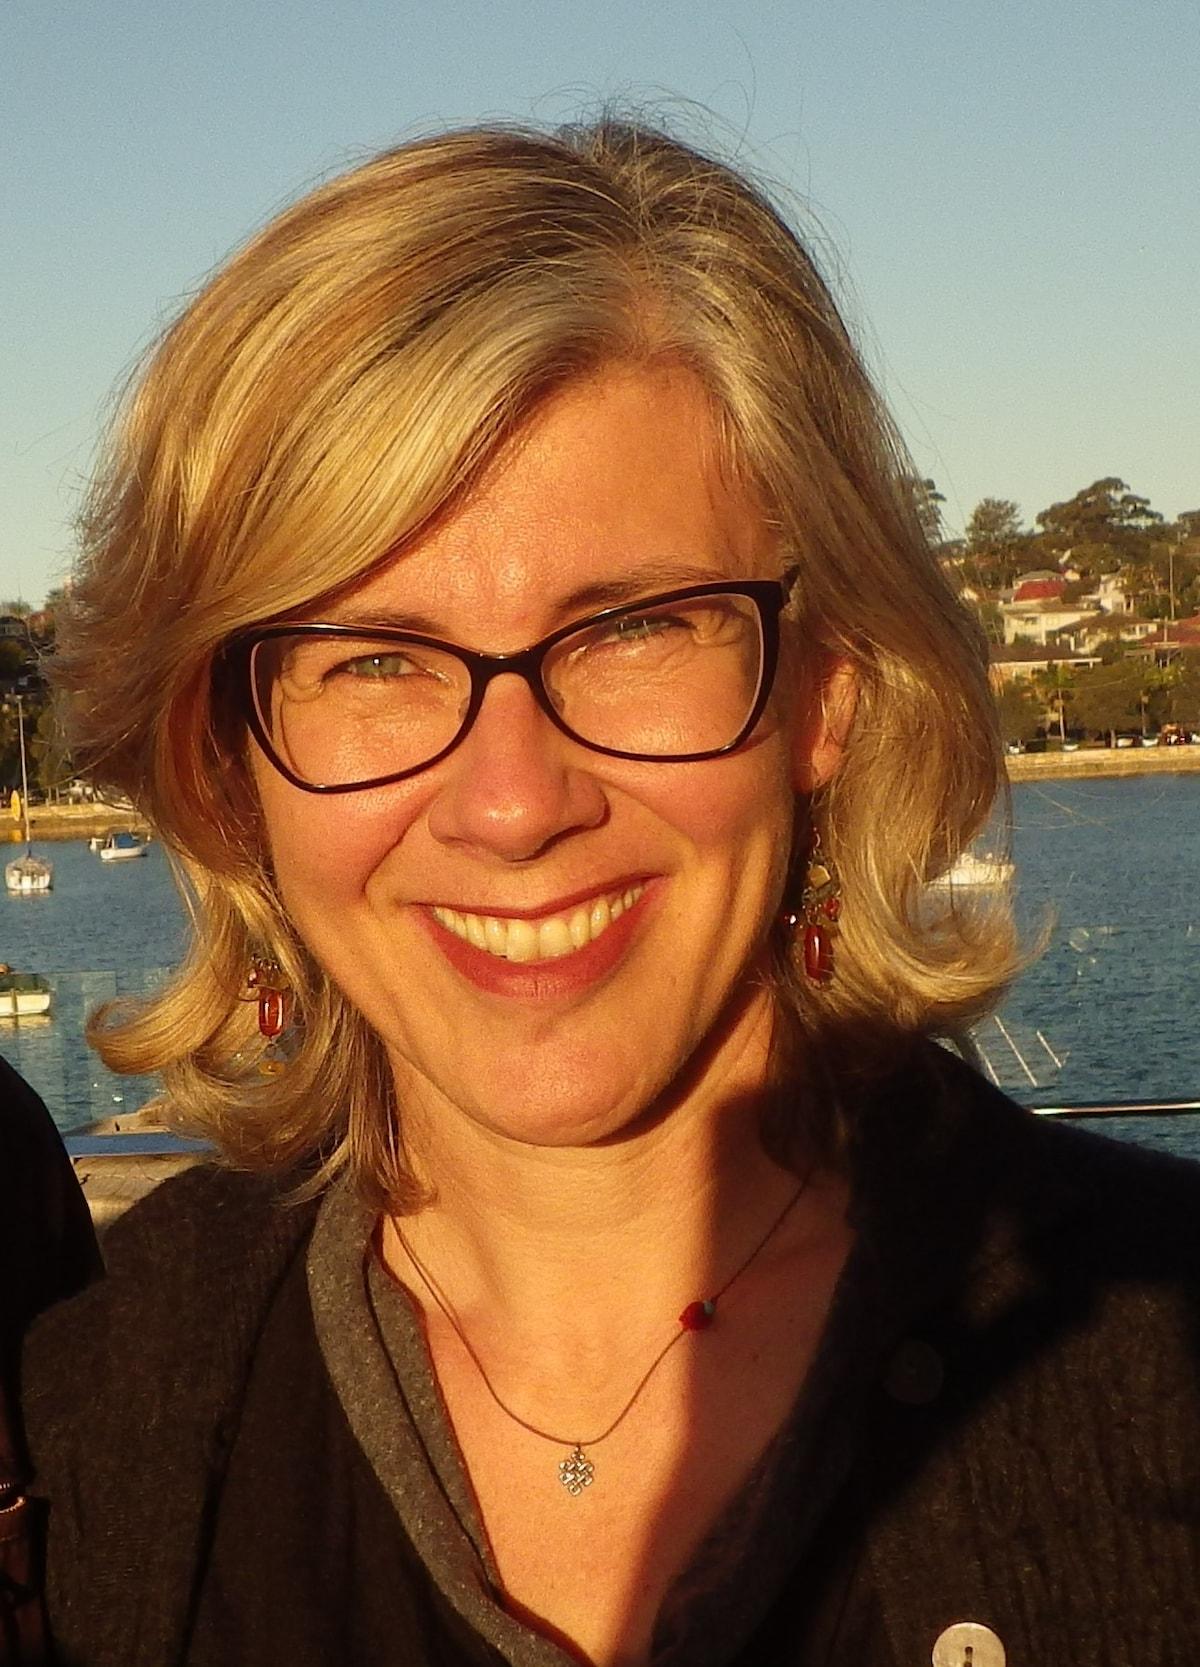 Sally From Balmain, Australia